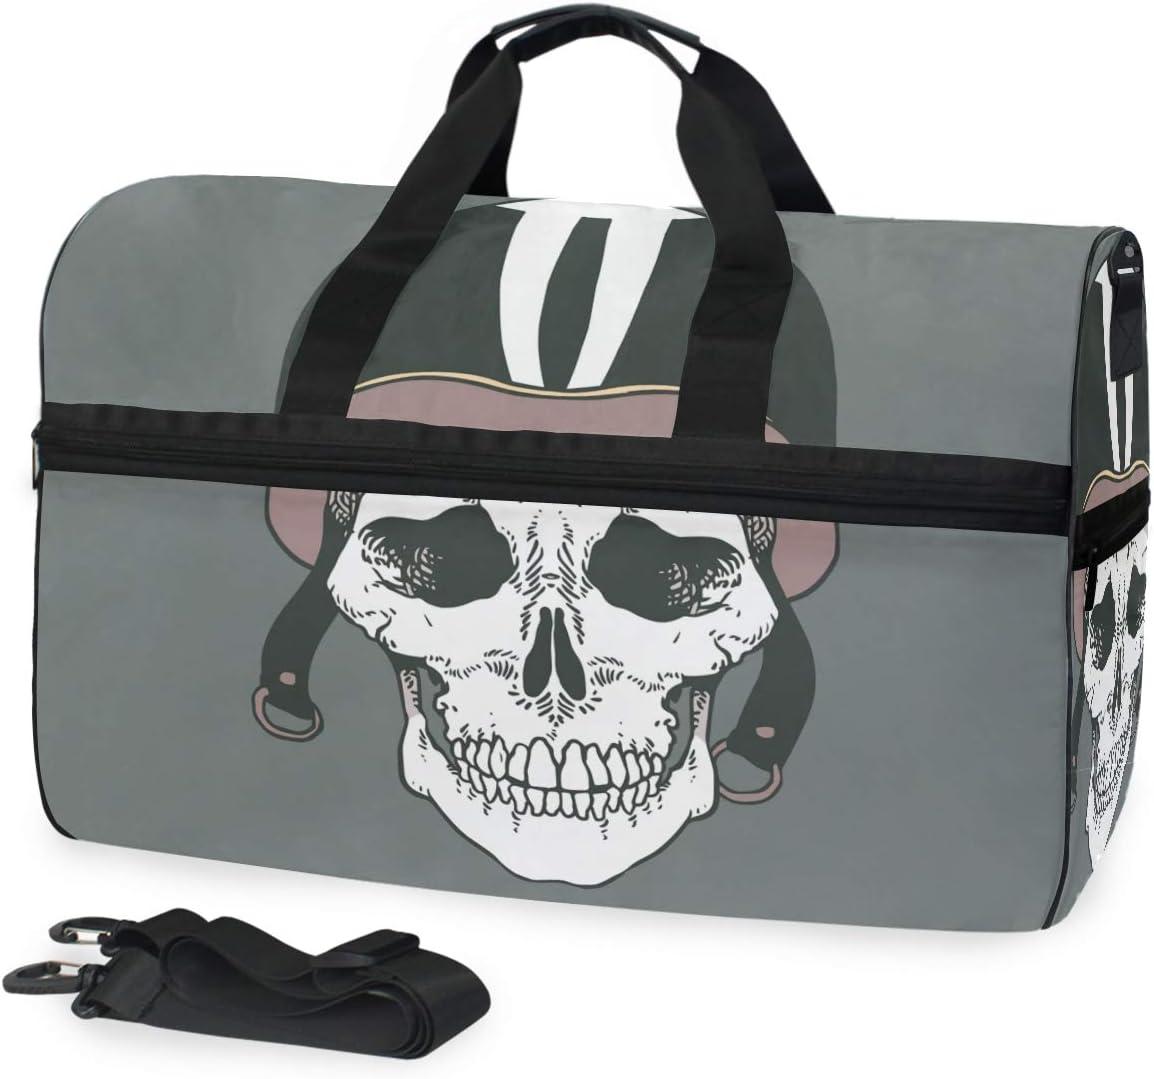 Lightweight Water Resistant Tear Resistant FANTAZIO Skull Head With Helmet Sports Bag Packable Travel Duffle Bag